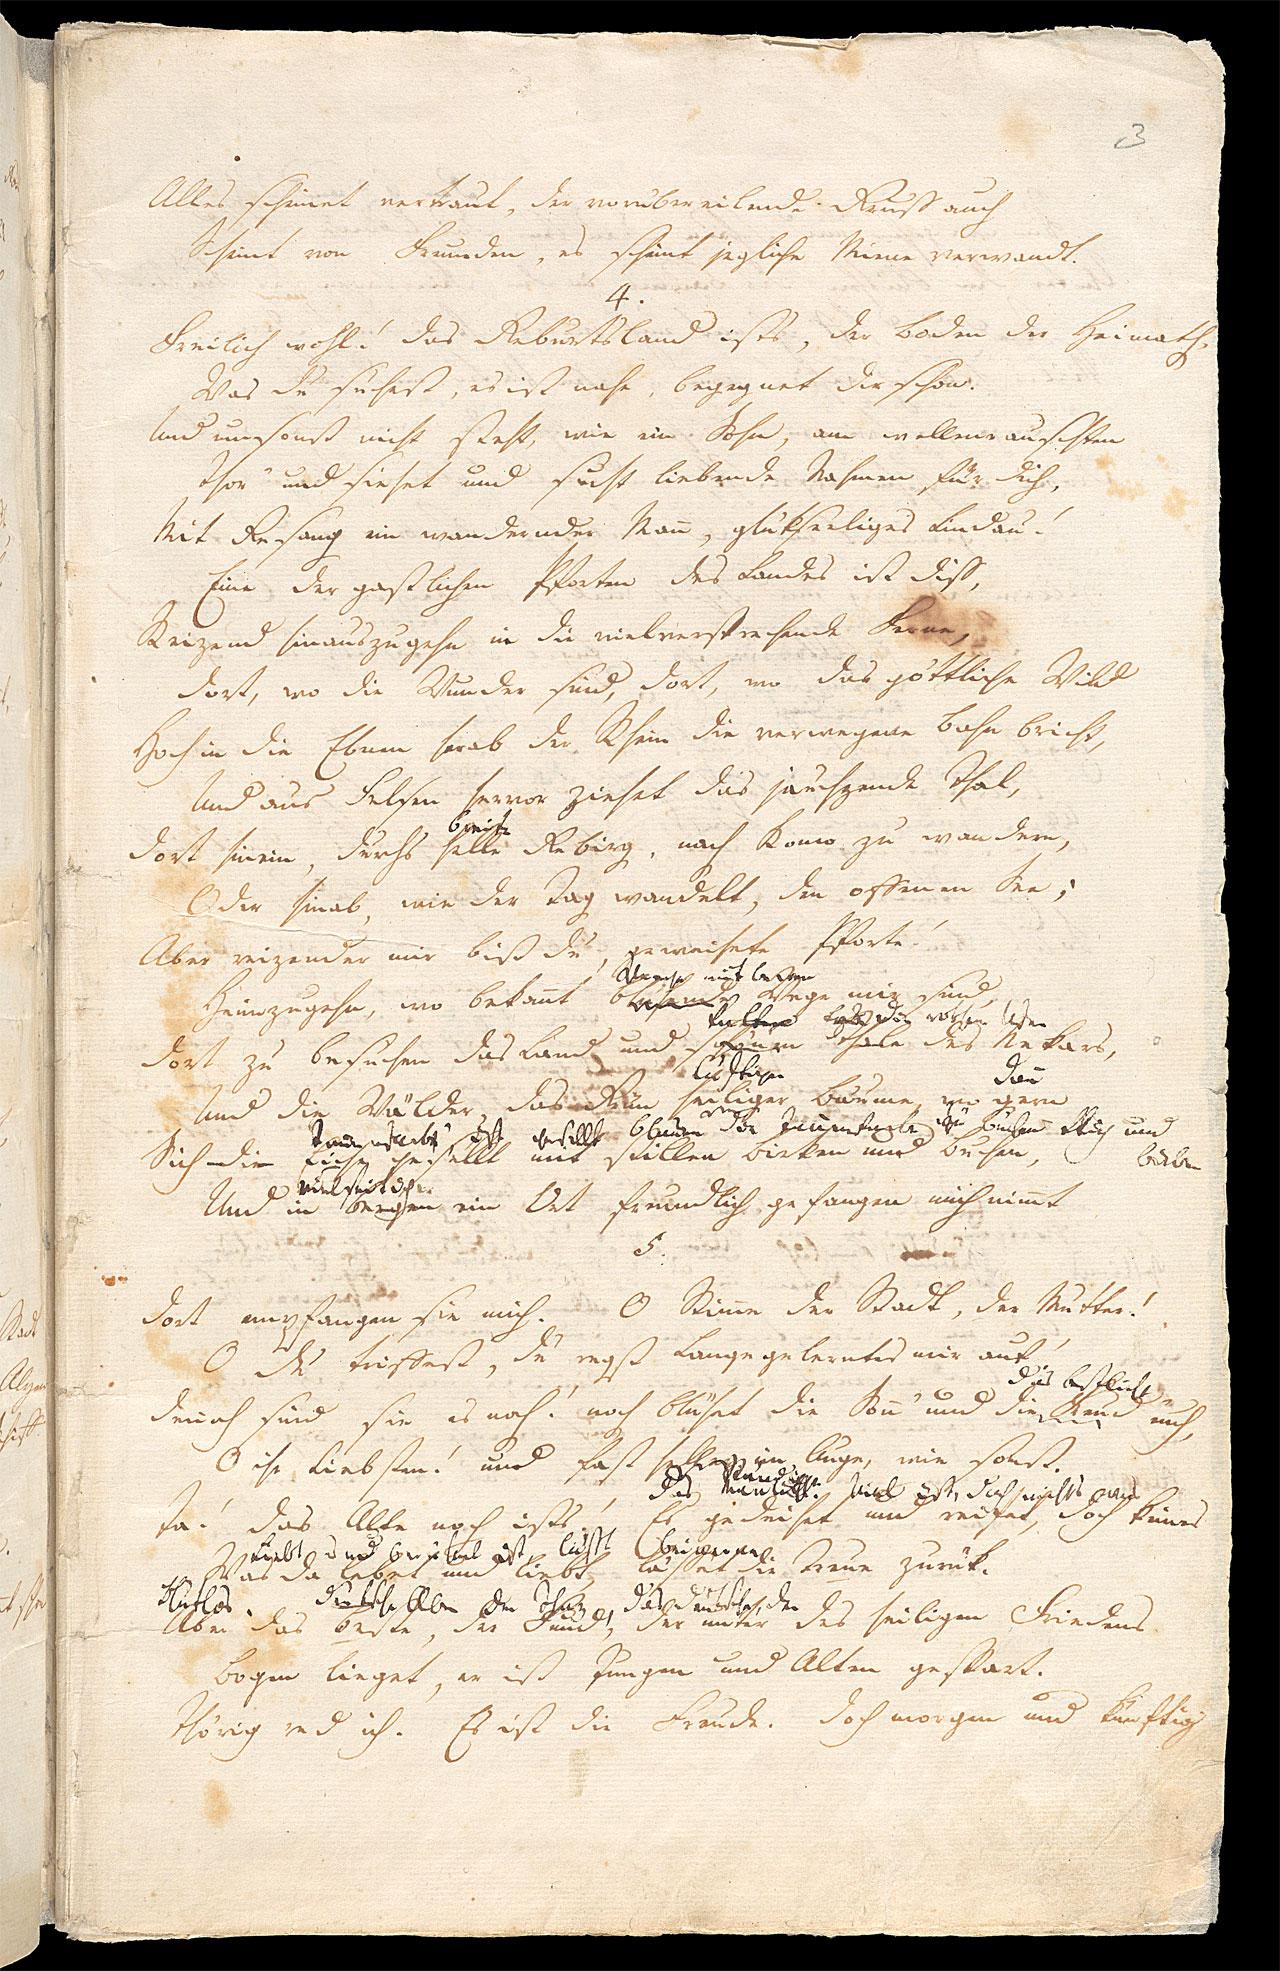 Friedrich Hölderlin, Homburger Folioheft, Seite 3, Heimkunft, Handschrift